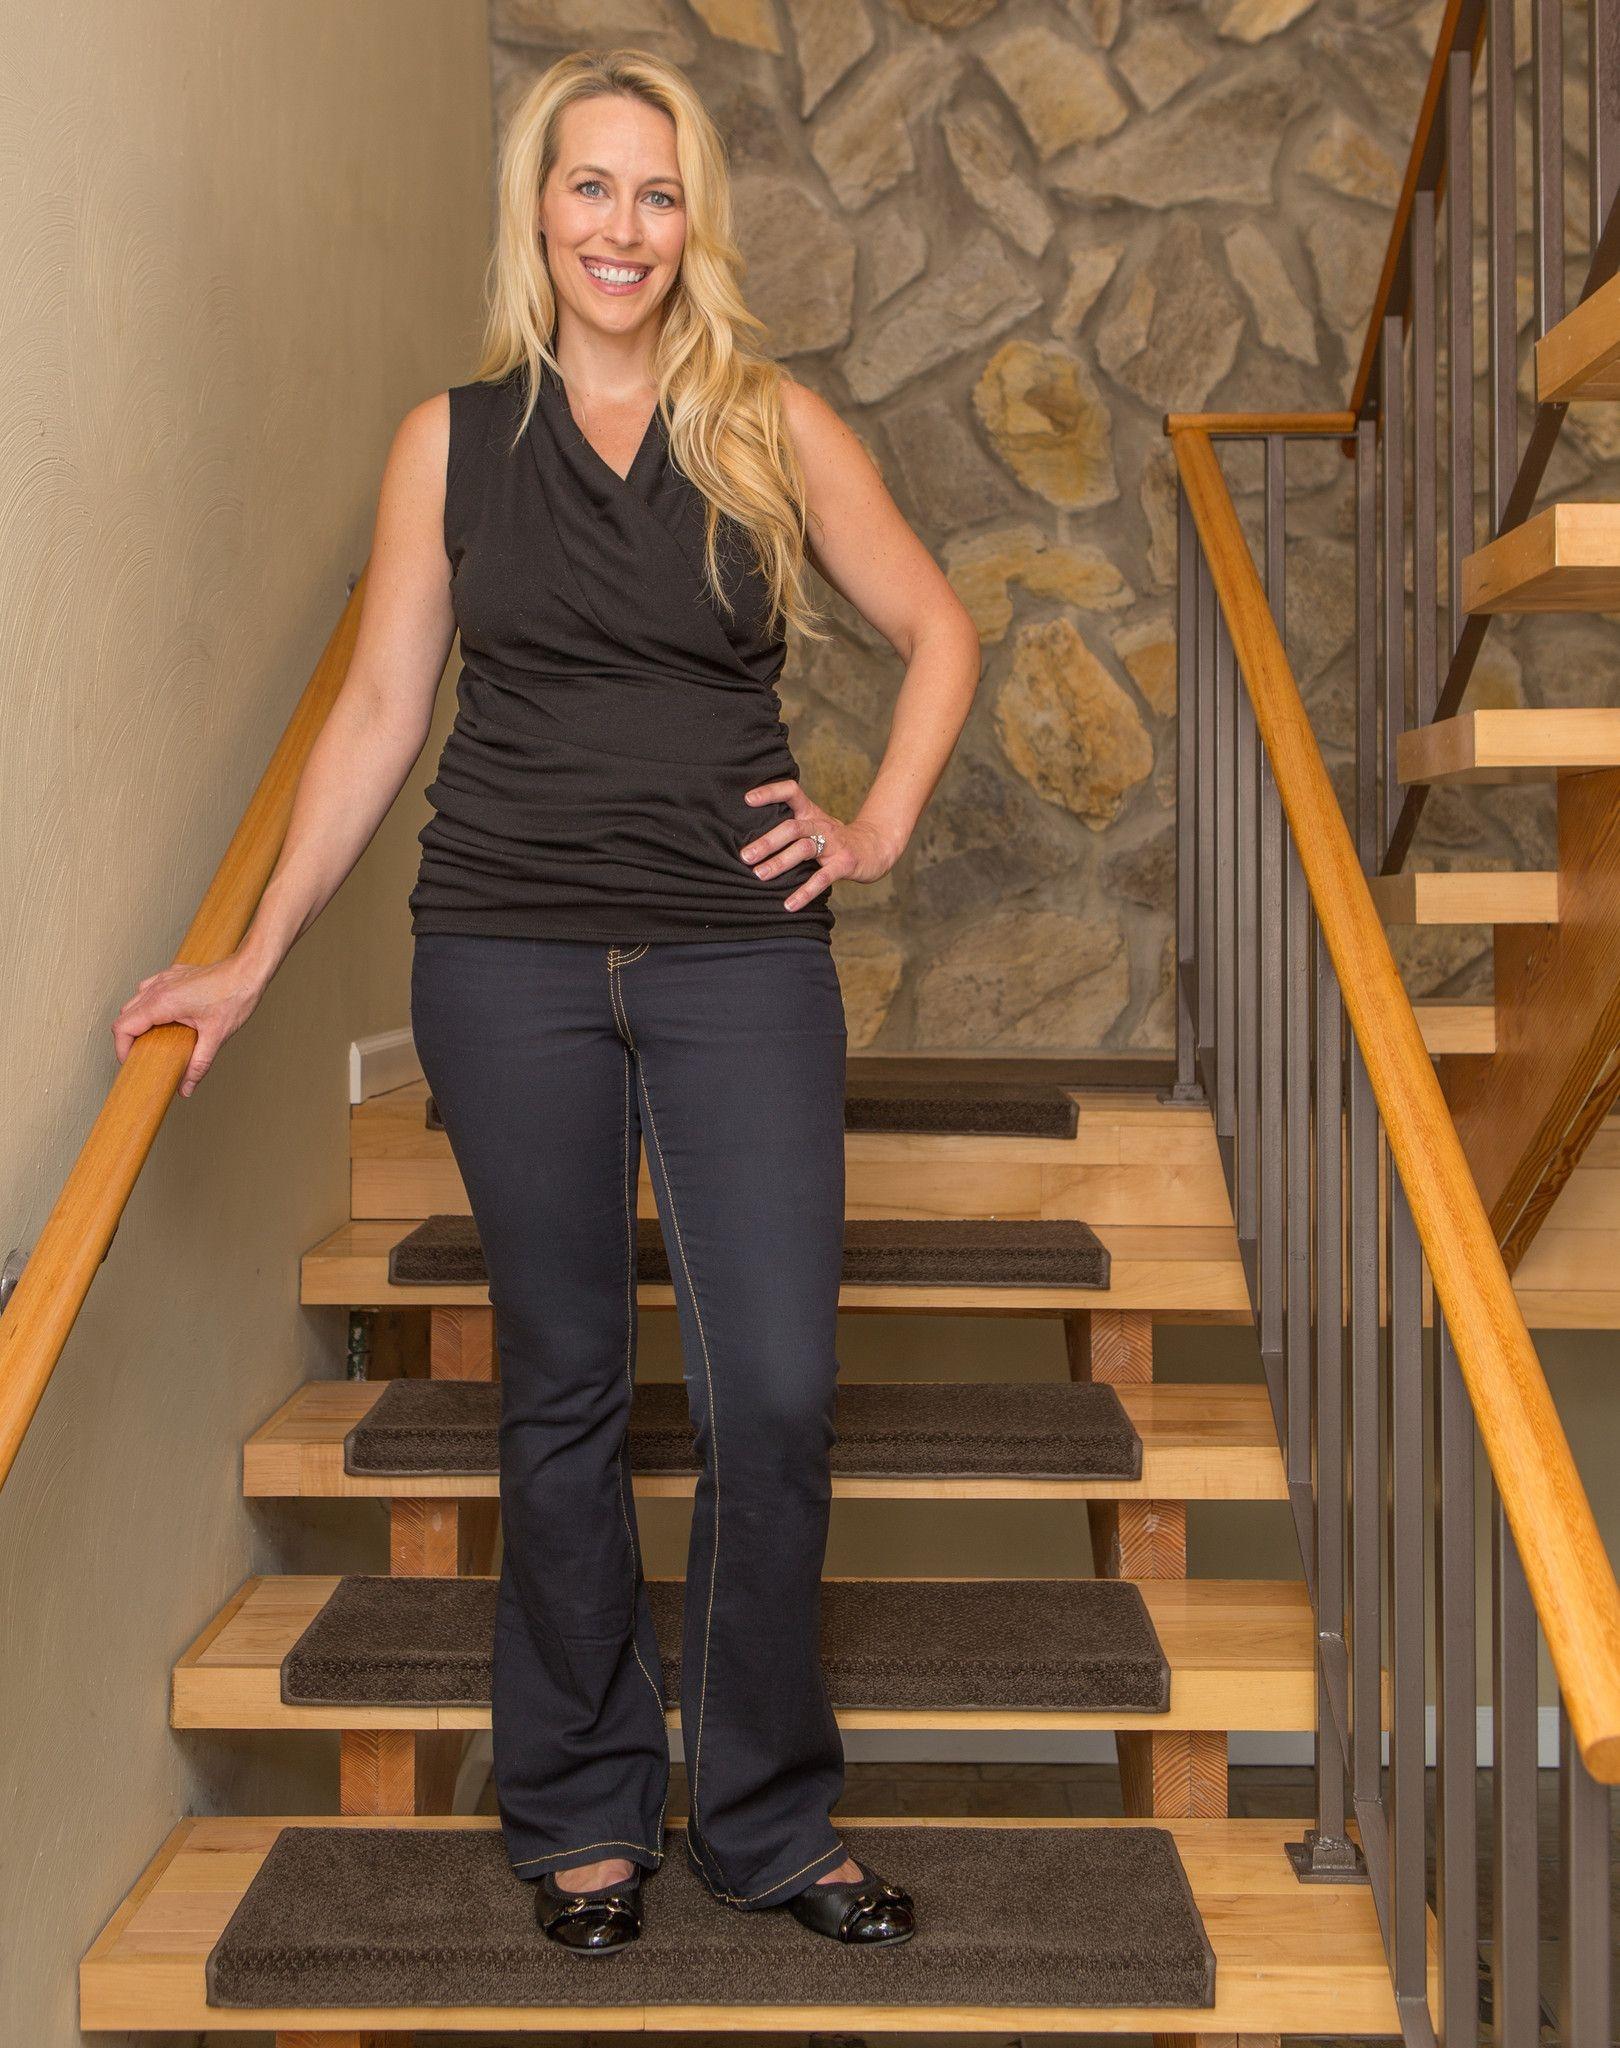 Warwick Adhesive Square Nose Carpet Stair Tread Hallway Within Stair Tread Carpet Adhesive (Image 15 of 15)